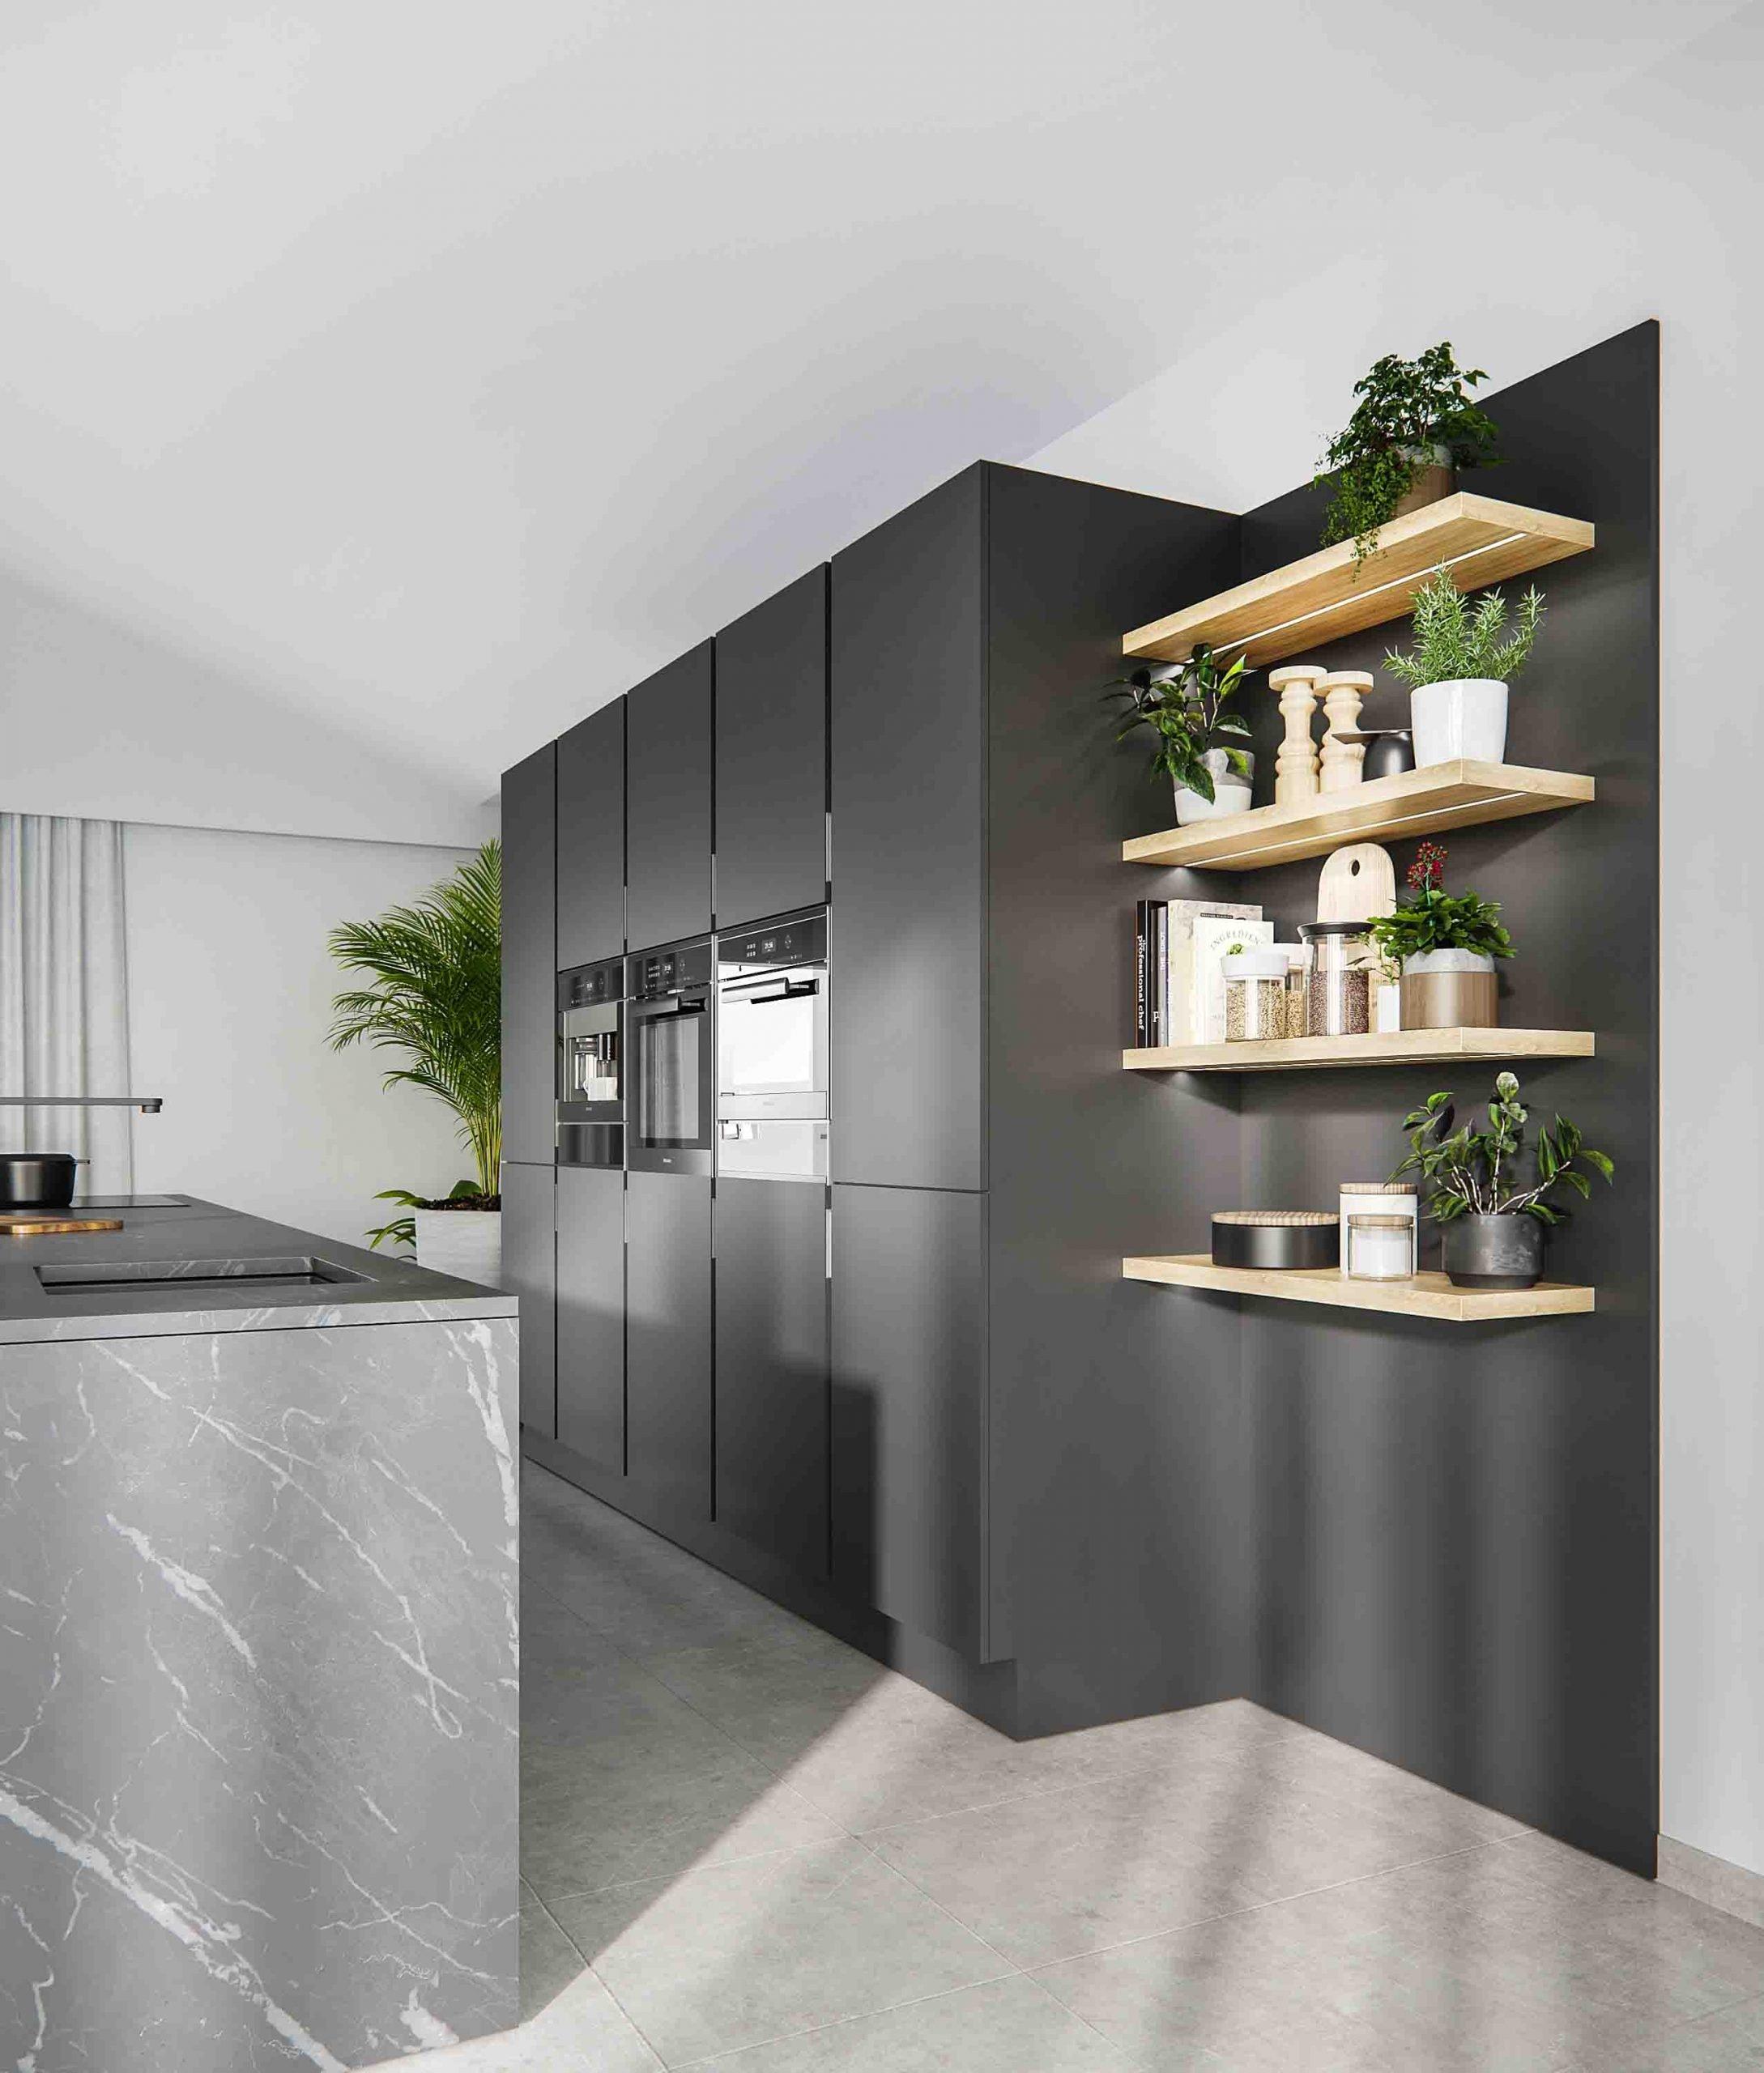 https://dprostudio.com/wp-content/uploads/2021/01/GRIXTI_01_kitchen_venus_hq_cam3-copy-scaled.jpg